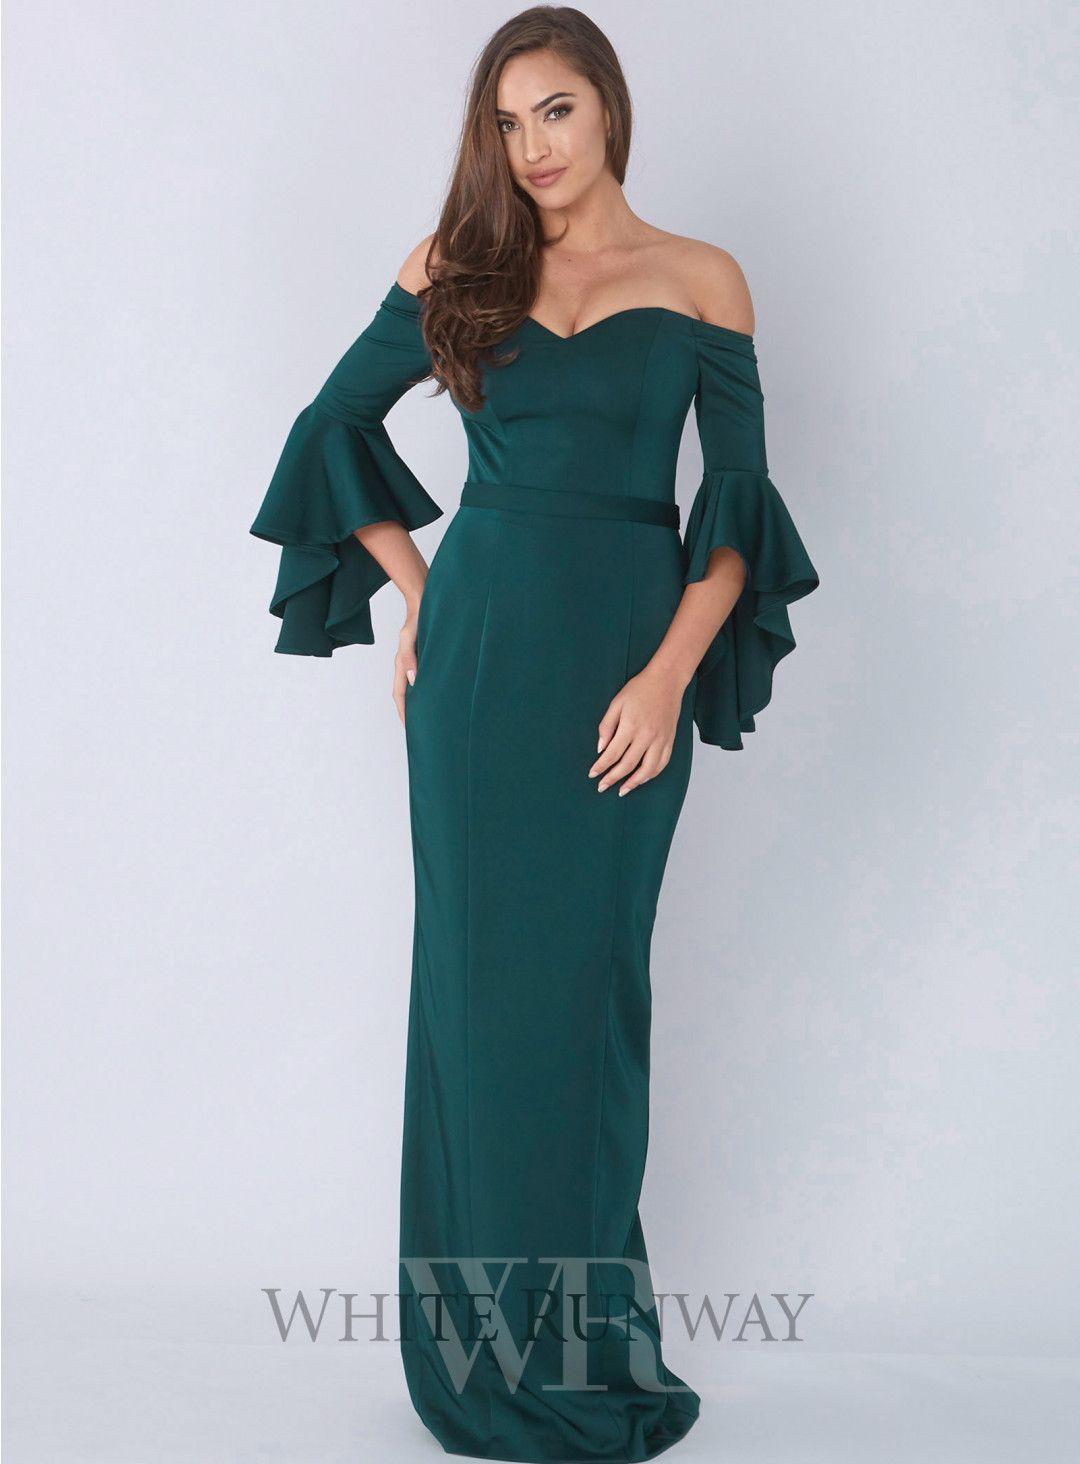 c02a43a1987f Mila Dress. A stunning full length dress by Jadore. An off shoulder style  featuring a sweetheart neckline